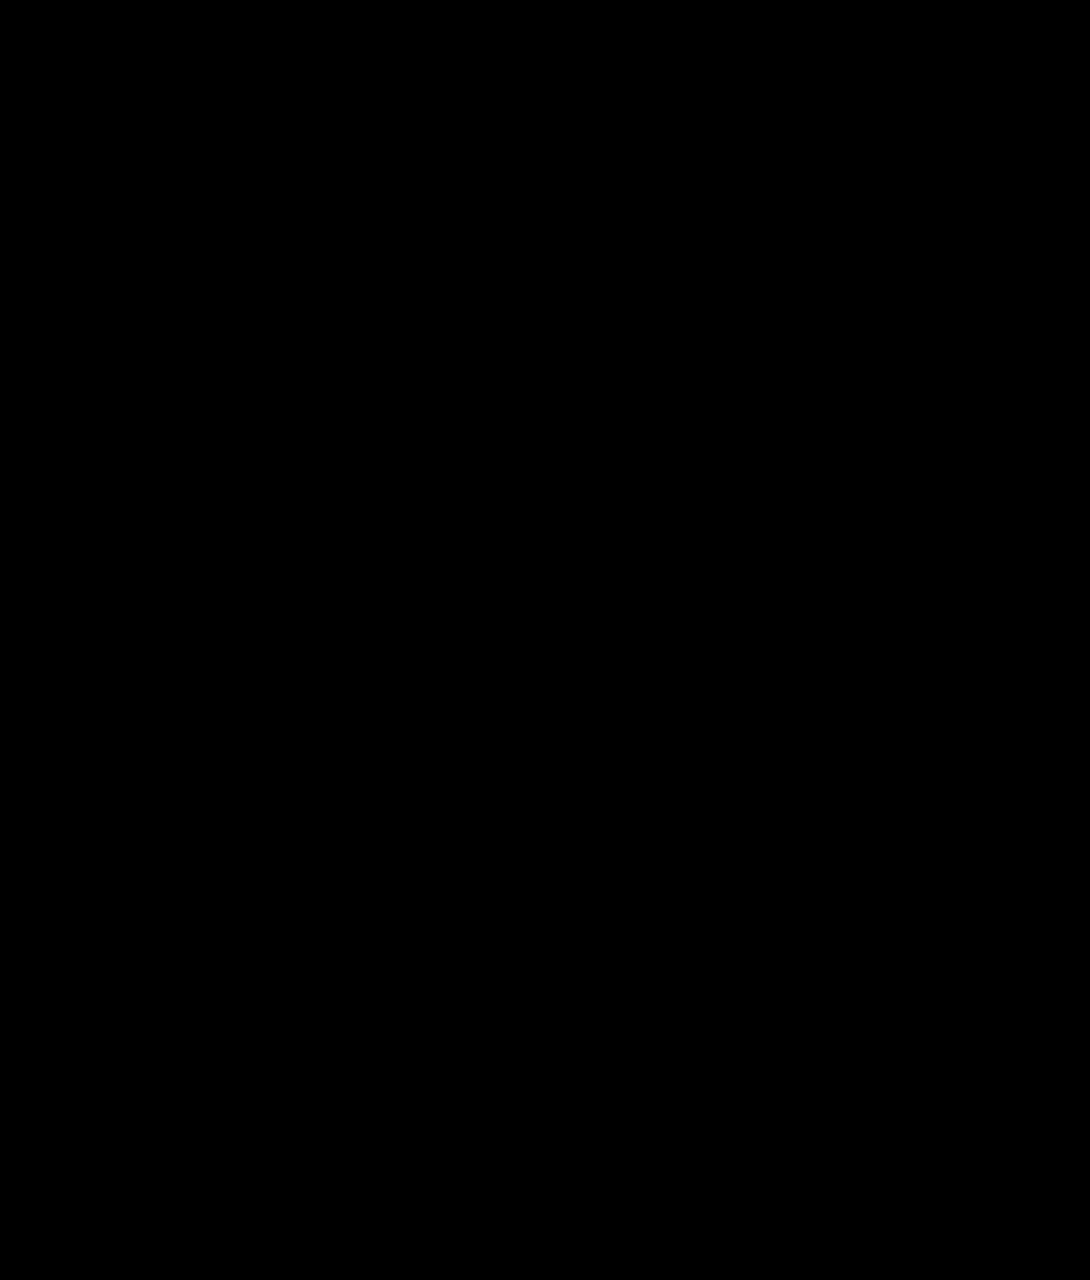 silhouette-3130566_1280